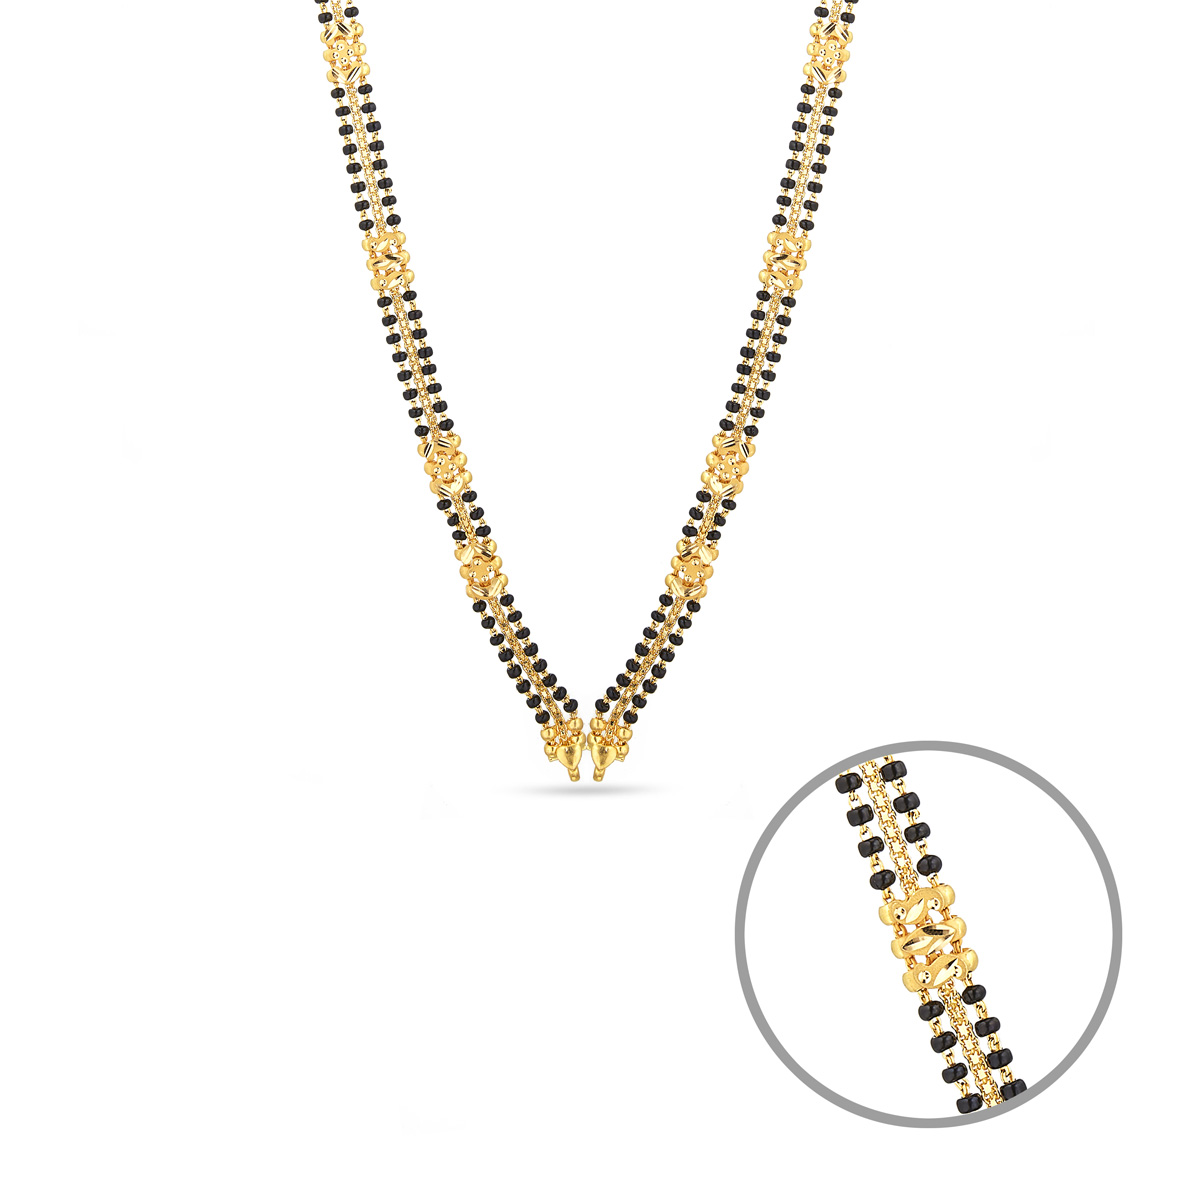 Gold Mangalsutra Chain